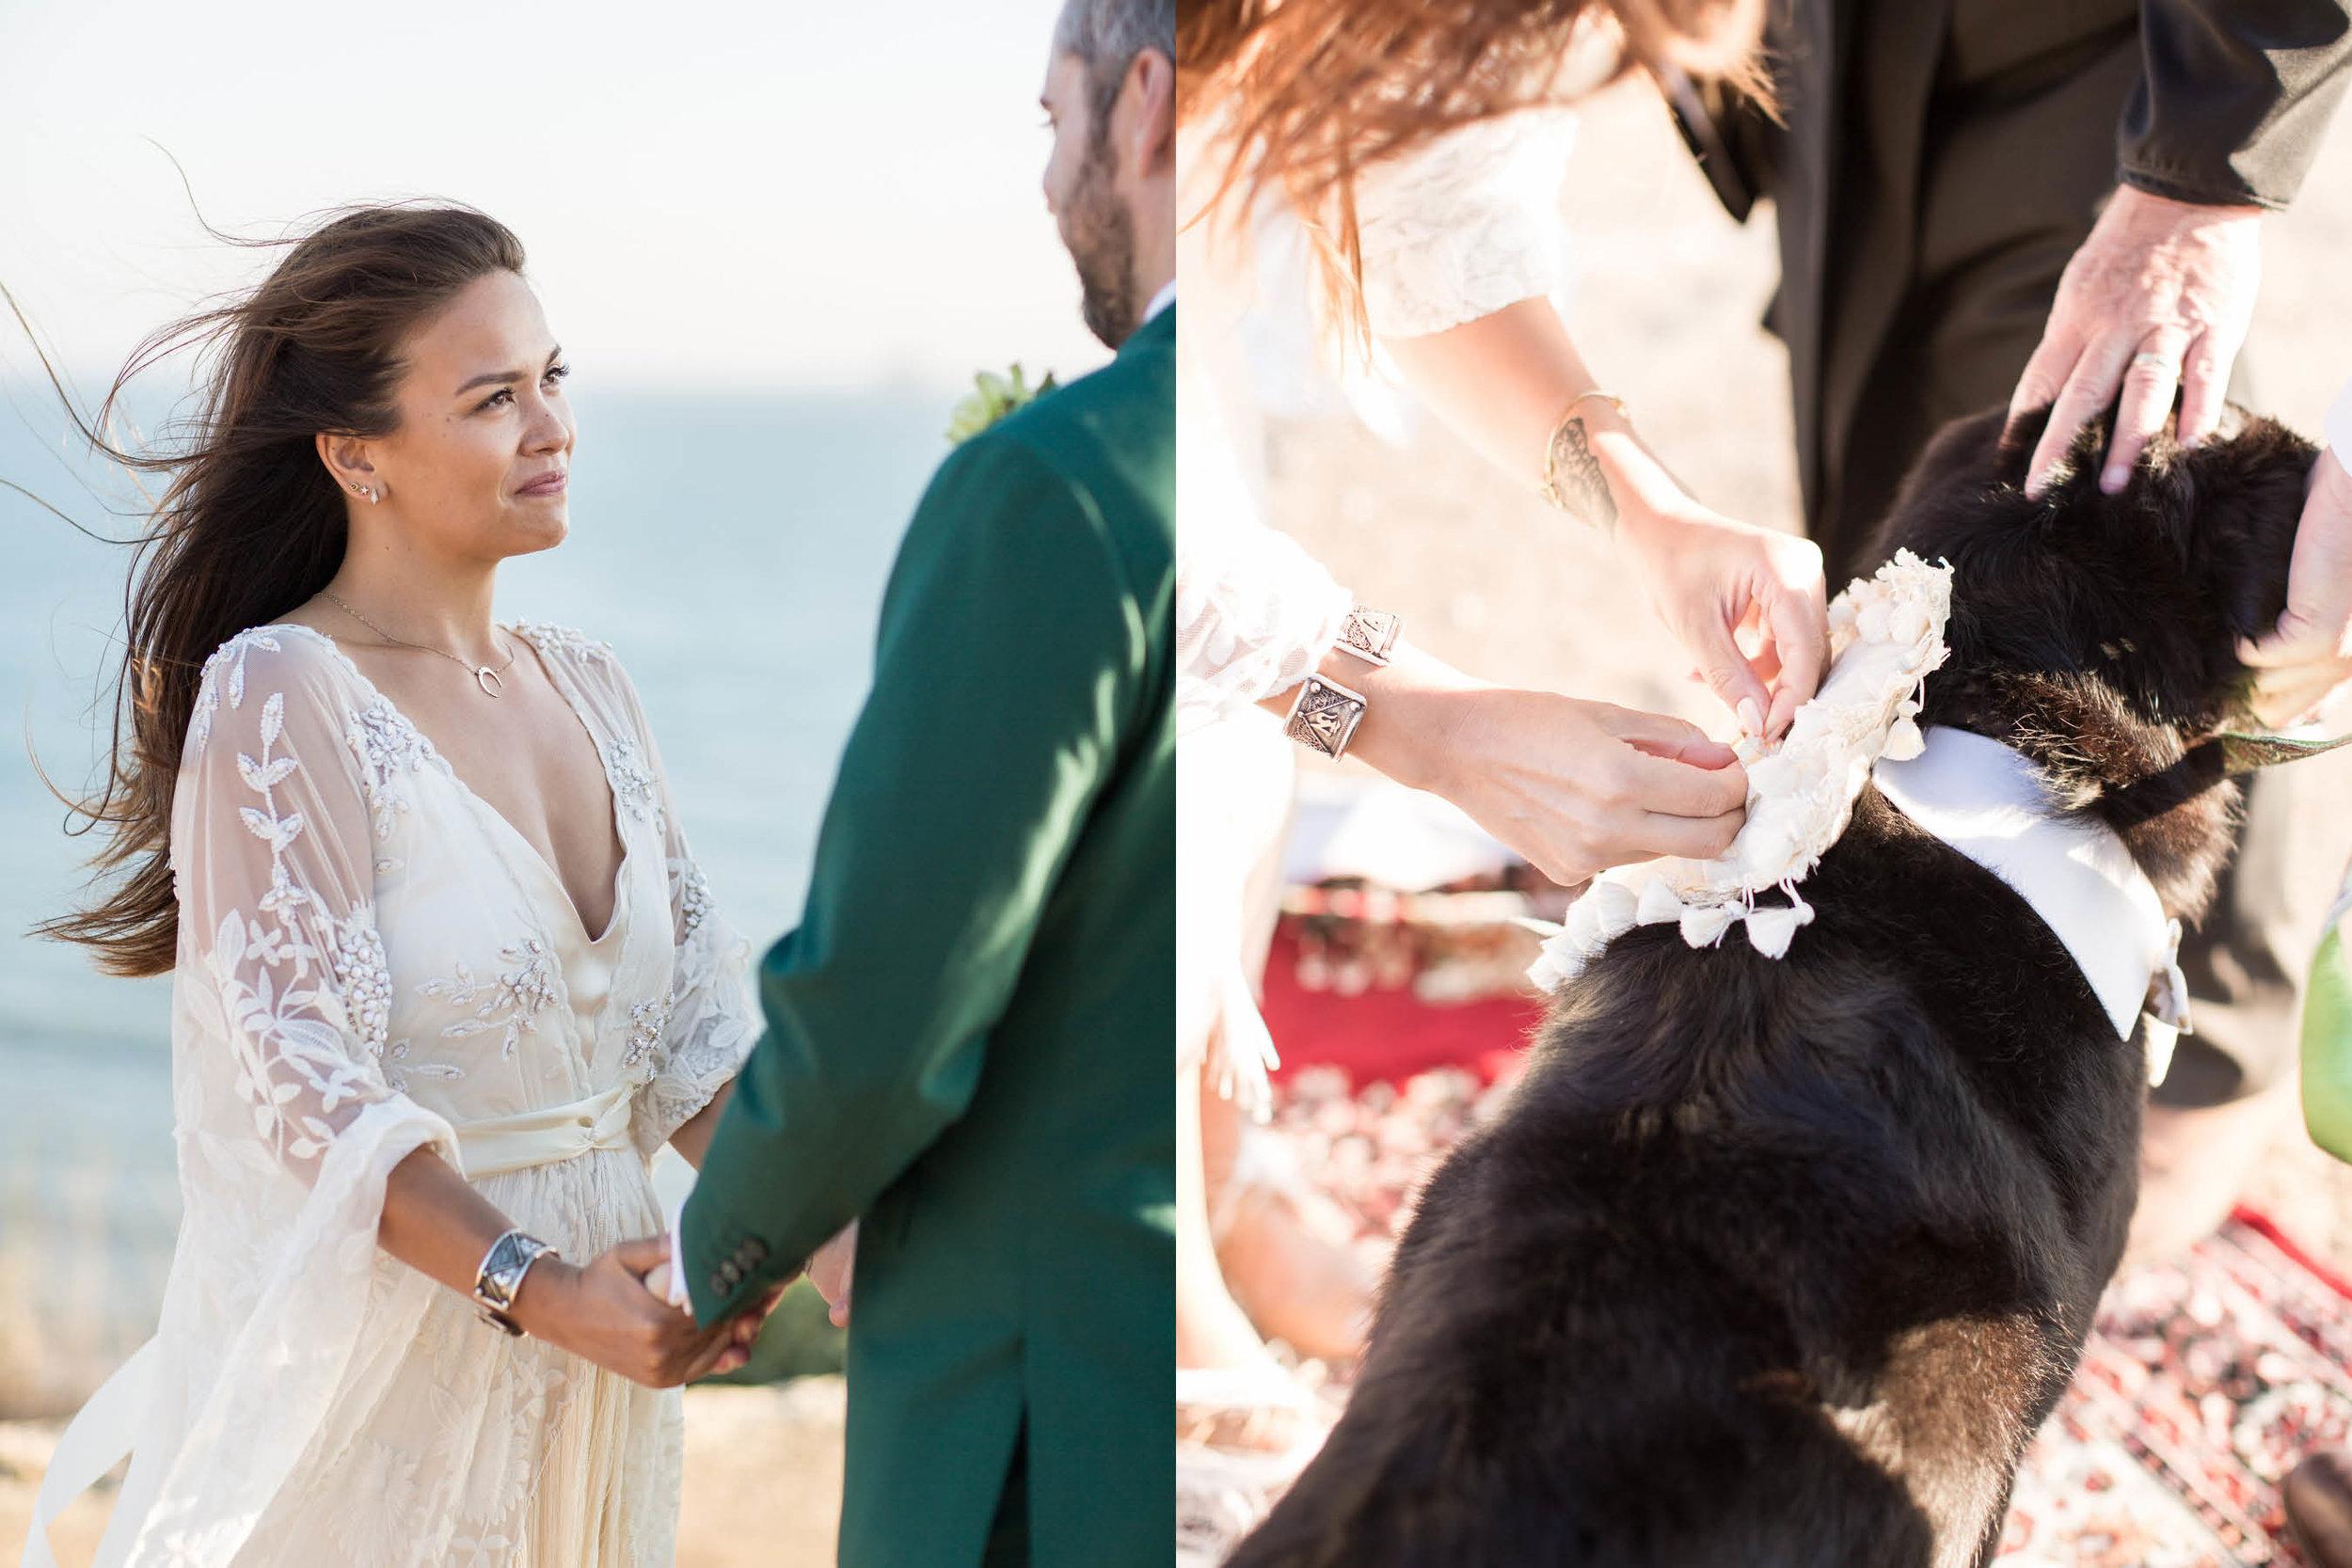 santa-barbara-elopement-elope-wedding-pop-up-coordinator-day-of-event-planning-planner-ellwood-bluff-eucalyptus-grove-rustic-ocean-view-front-hop-green-suit (1 (16).jpg